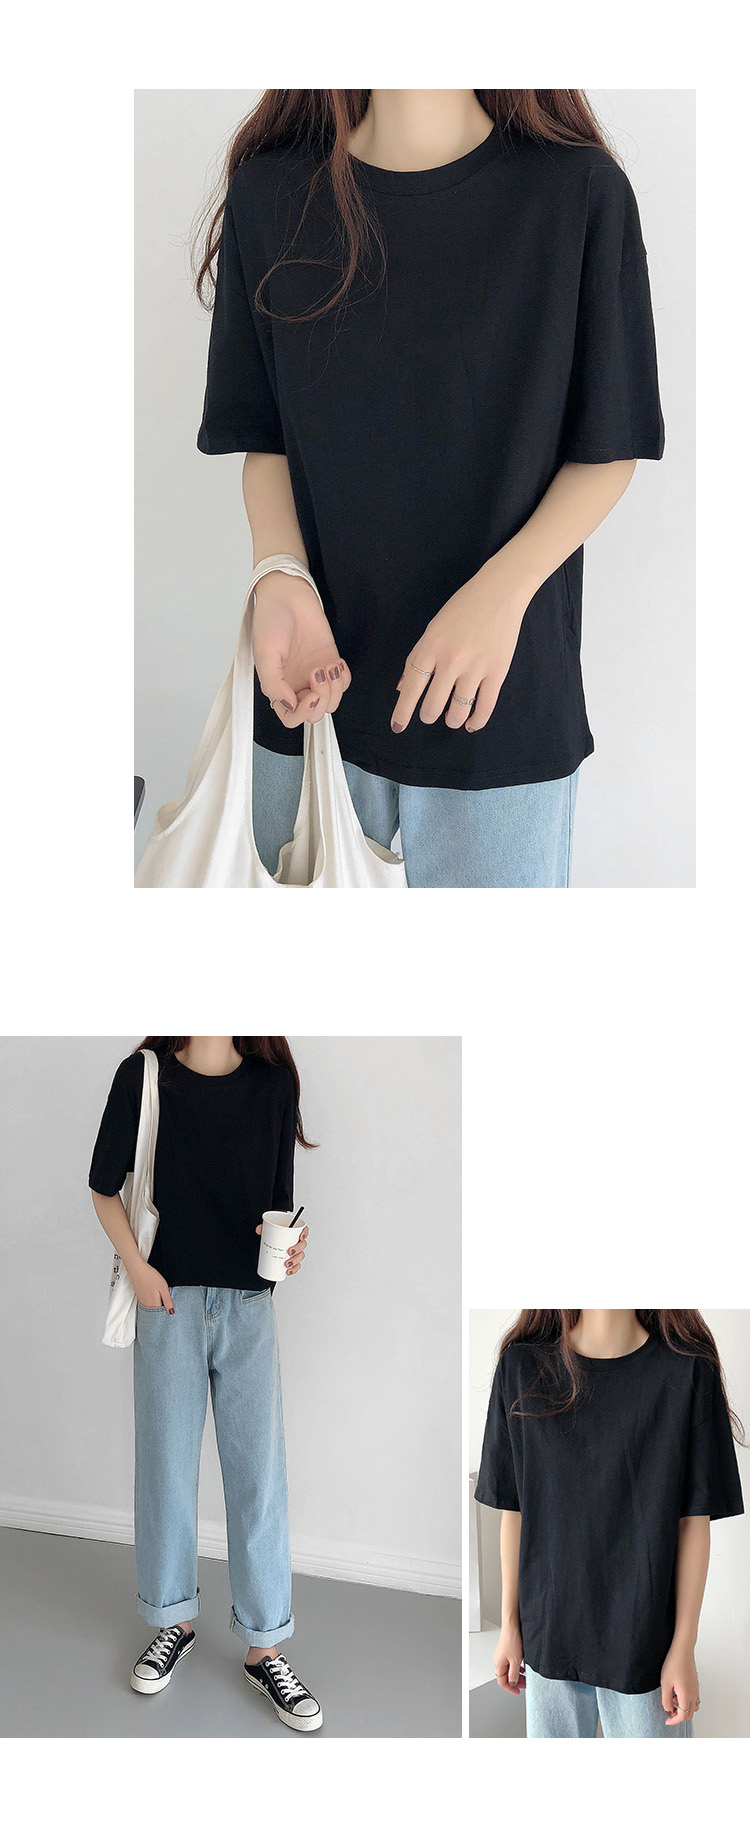 H69d5e3c633f7460ca9b6fdc20416866bn - Summer O-Neck Short Sleeves Minimalist Loose Basic T-Shirt